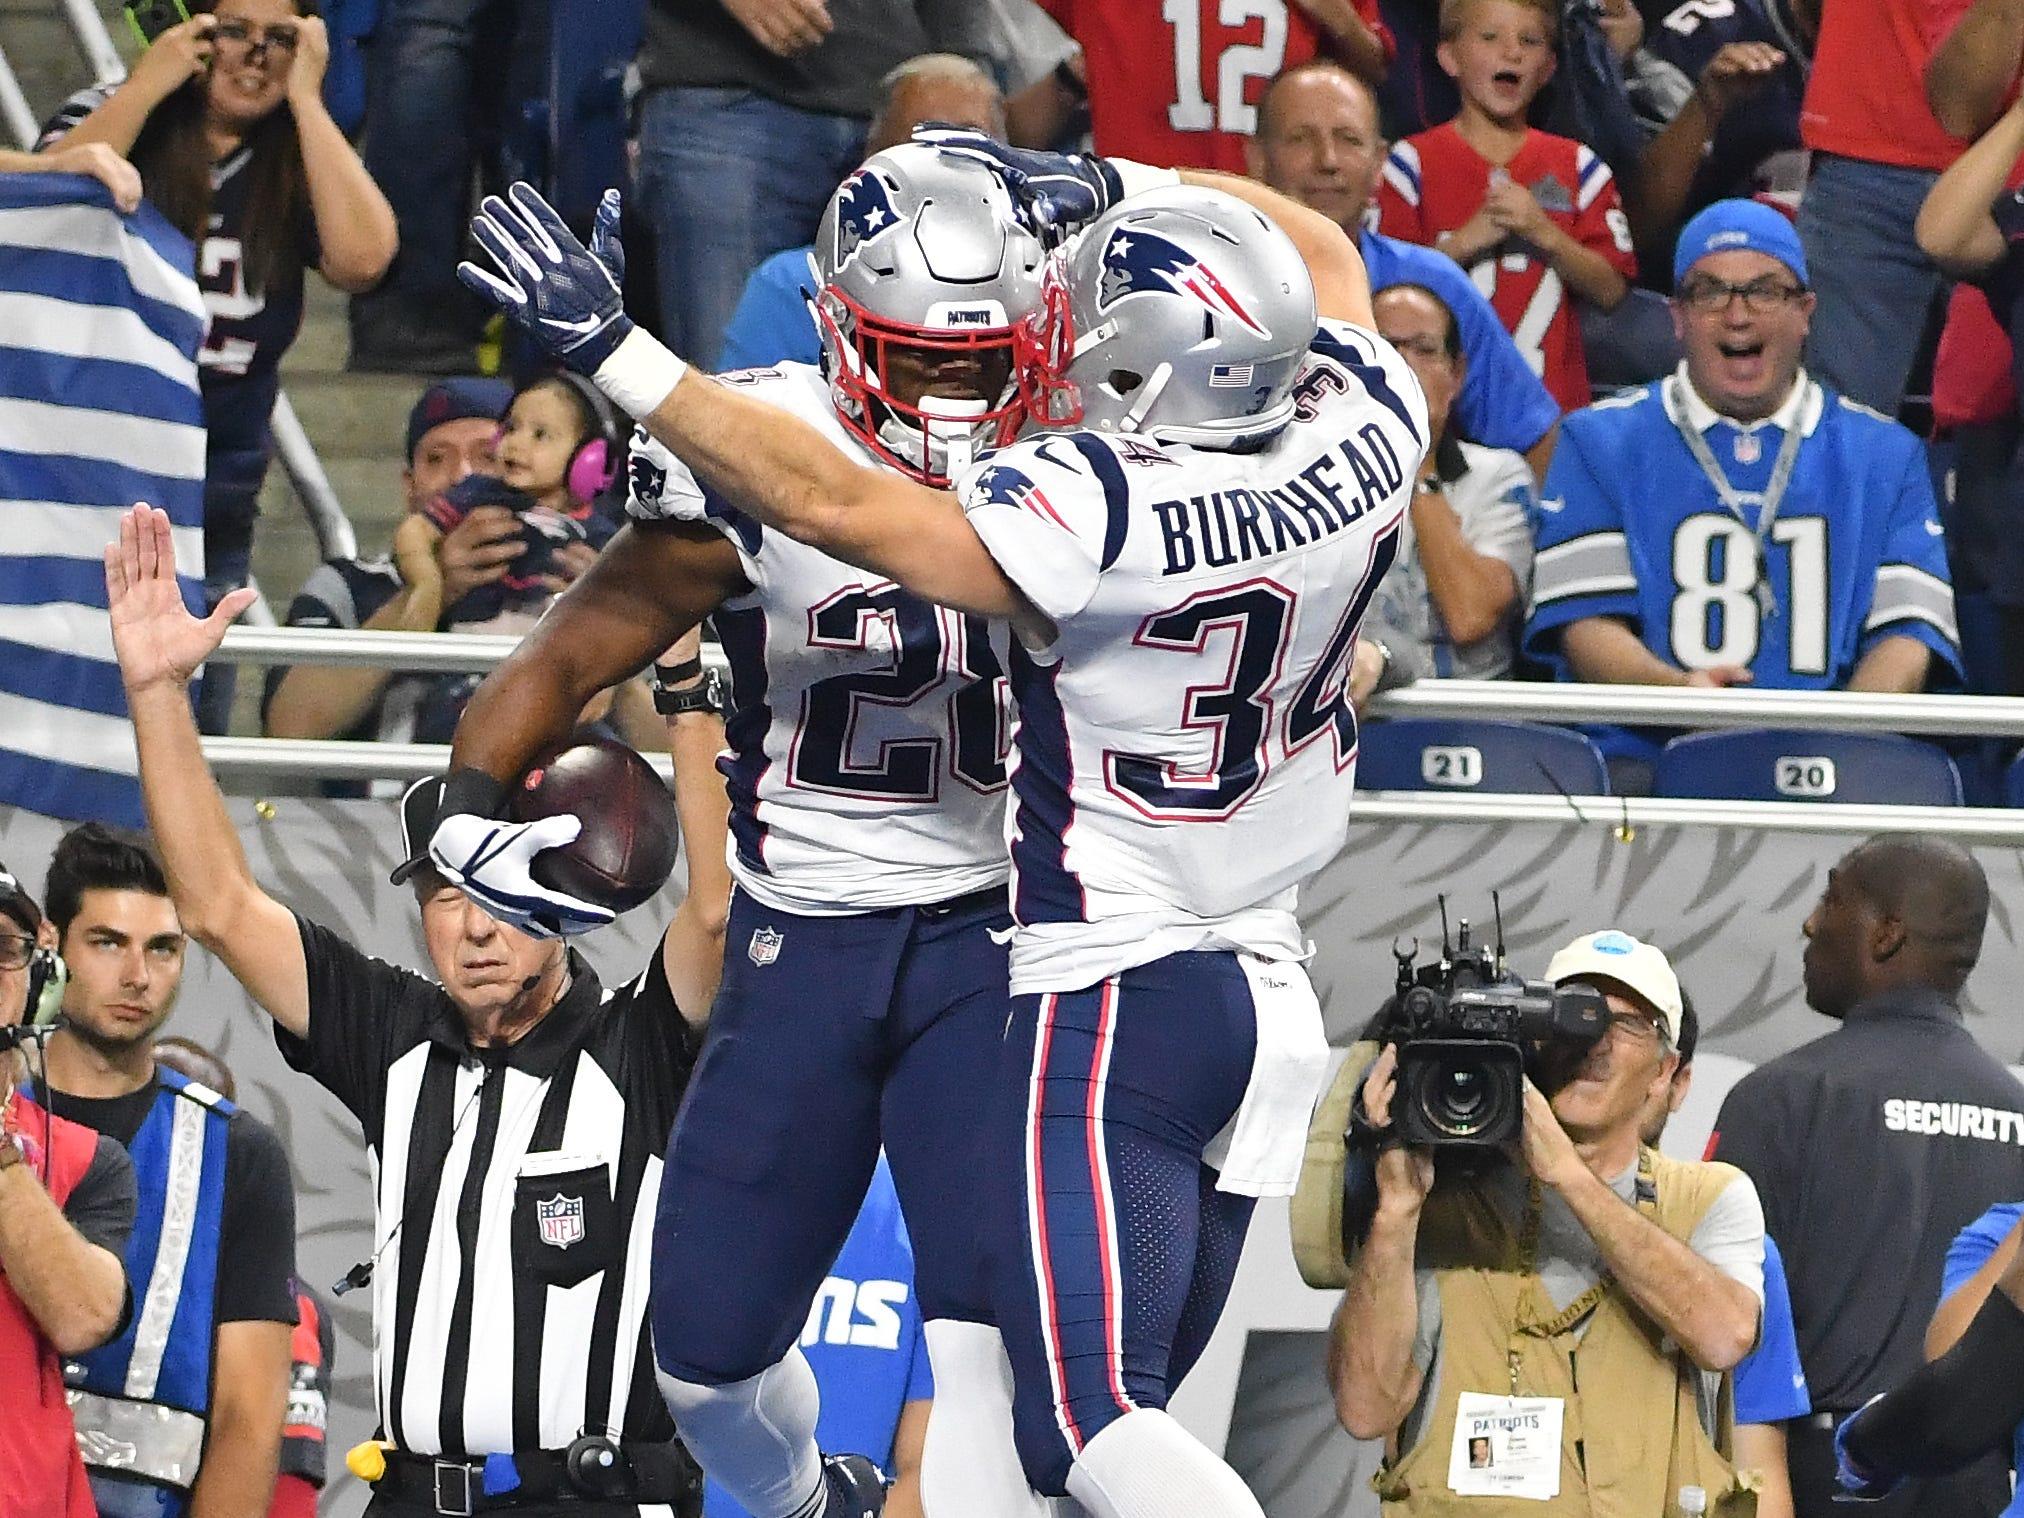 Patriots' James White and Rex Burkhead celebrate Whites touchdown in the 3rd quarter.